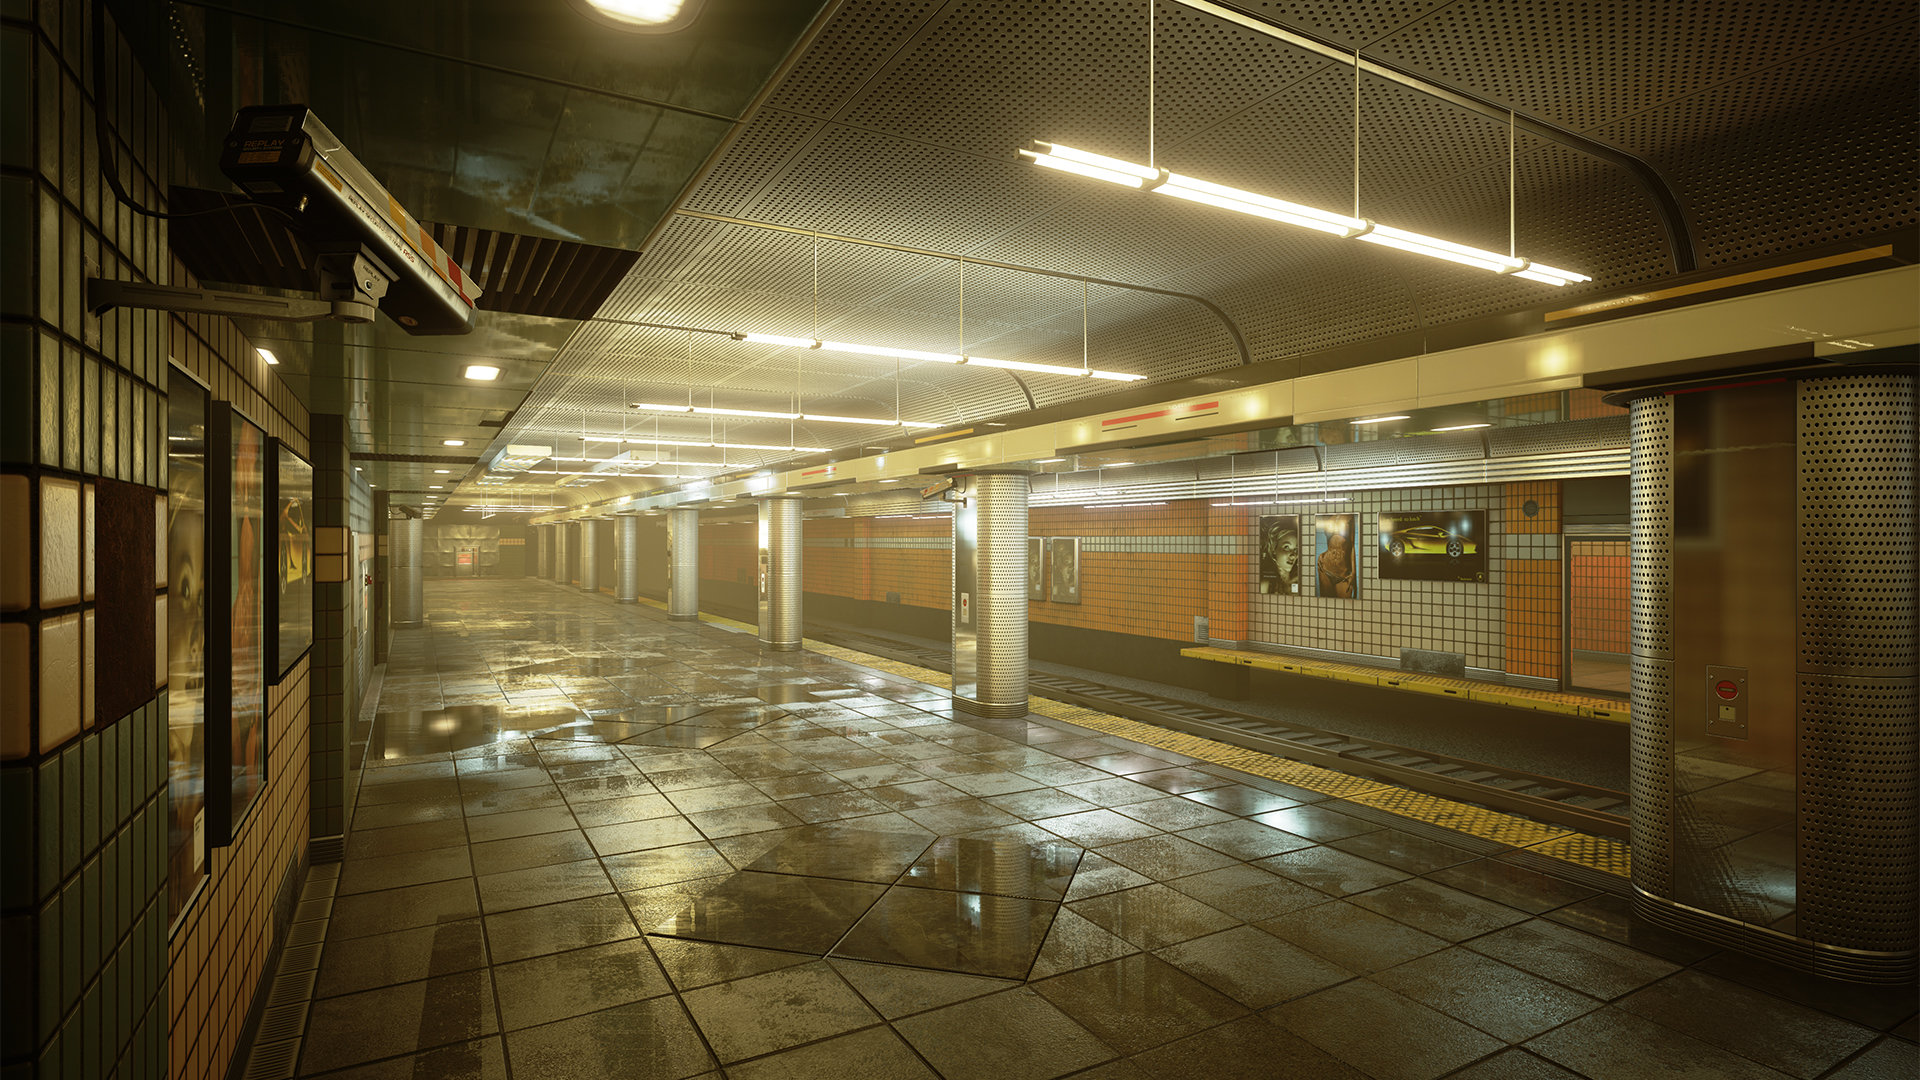 marcel-gonzales-subway02.jpg?1437581085